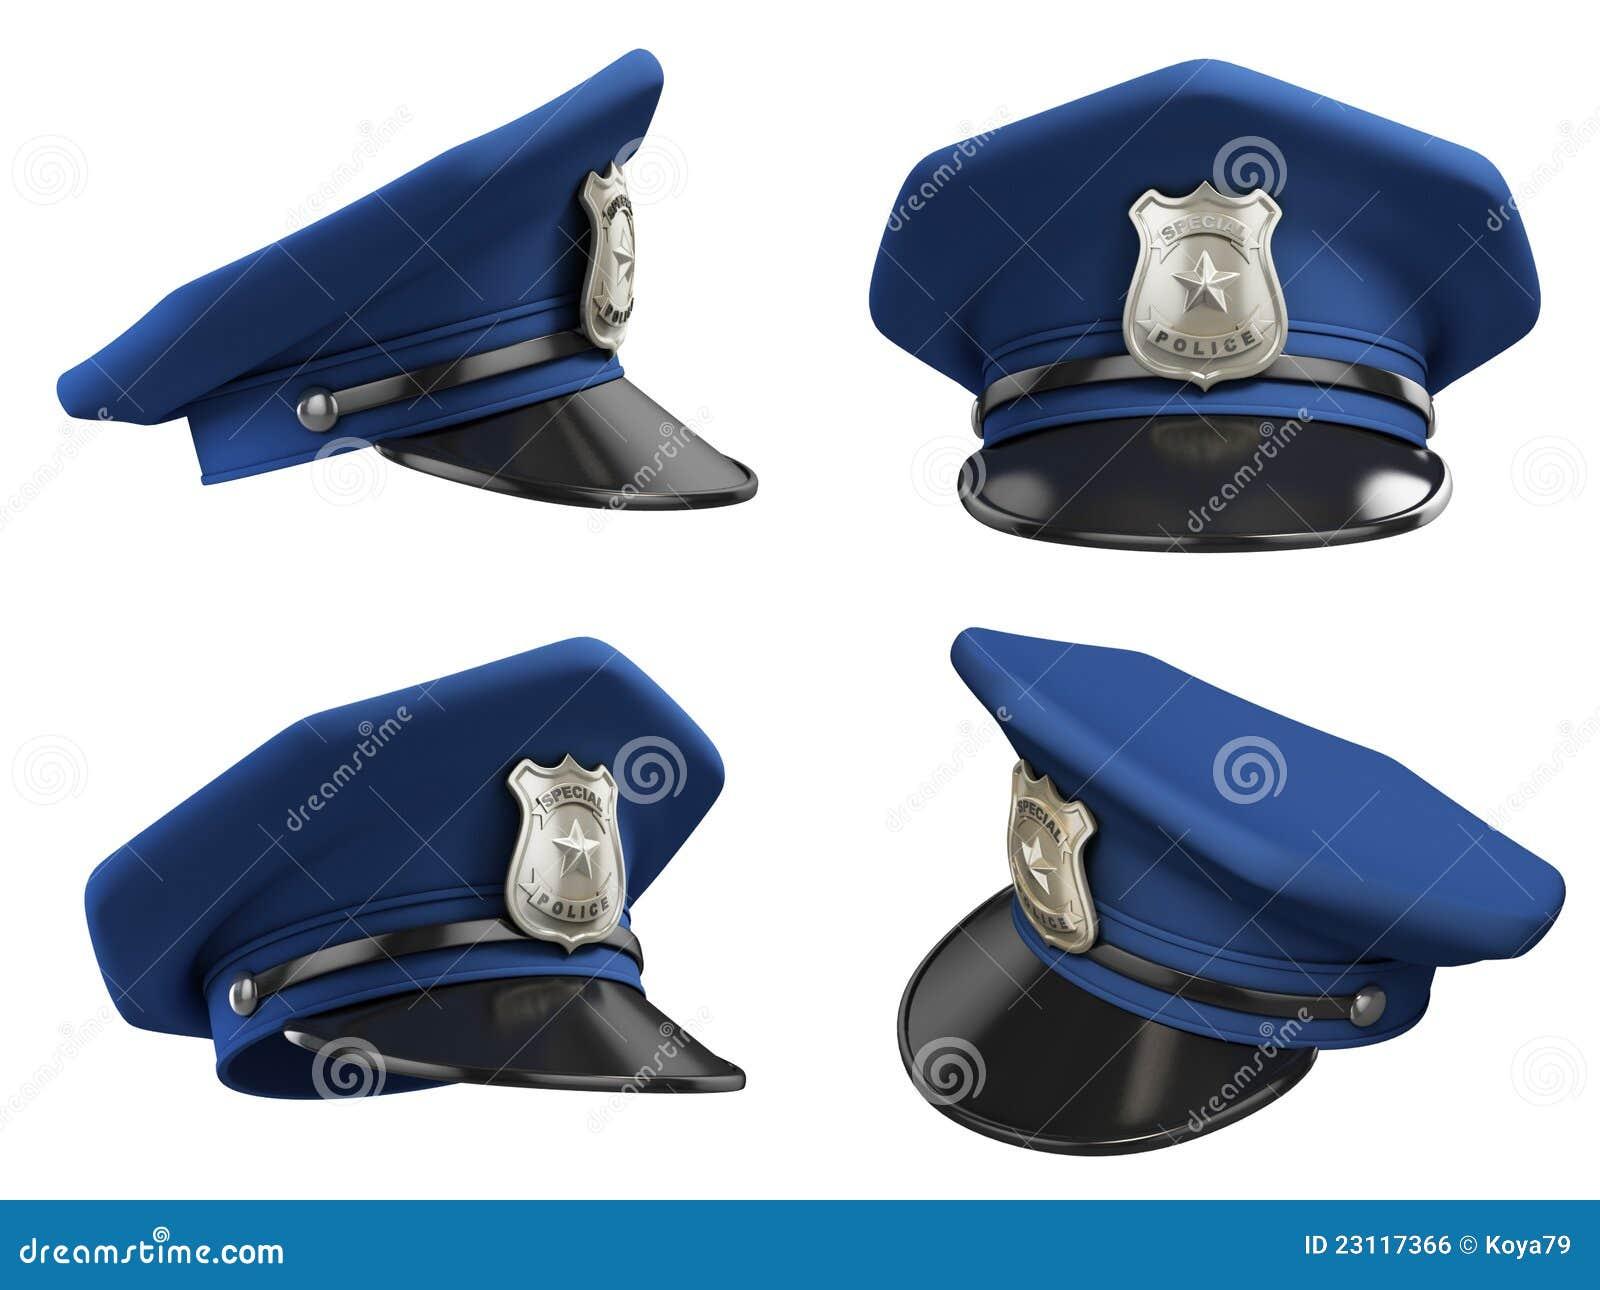 policeman hat royalty free stock image image 23117366